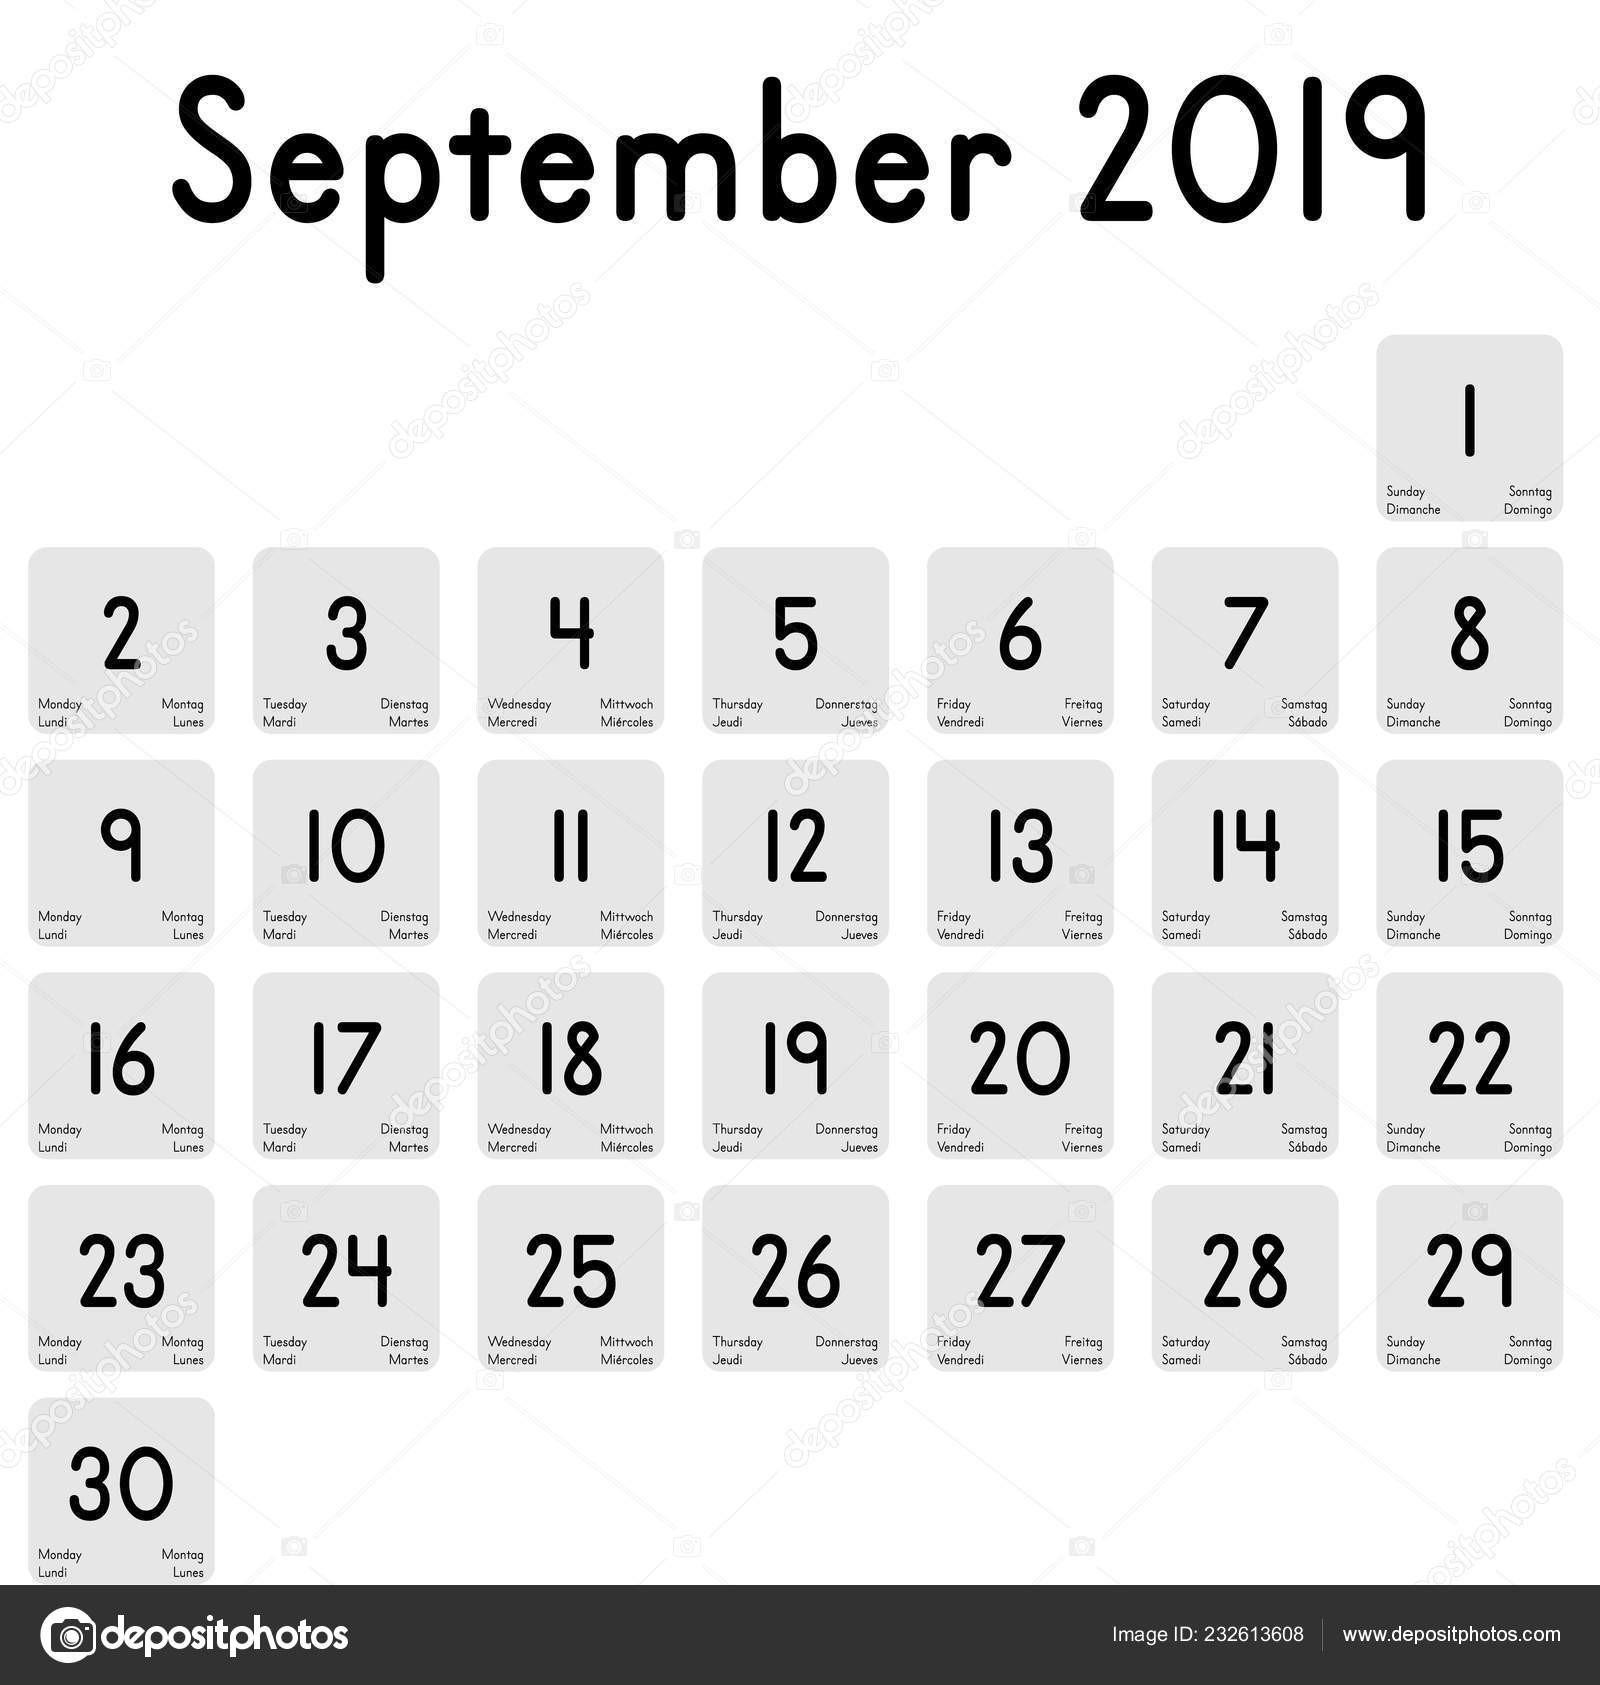 depositphotos stock illustration detailed daily calendar month september